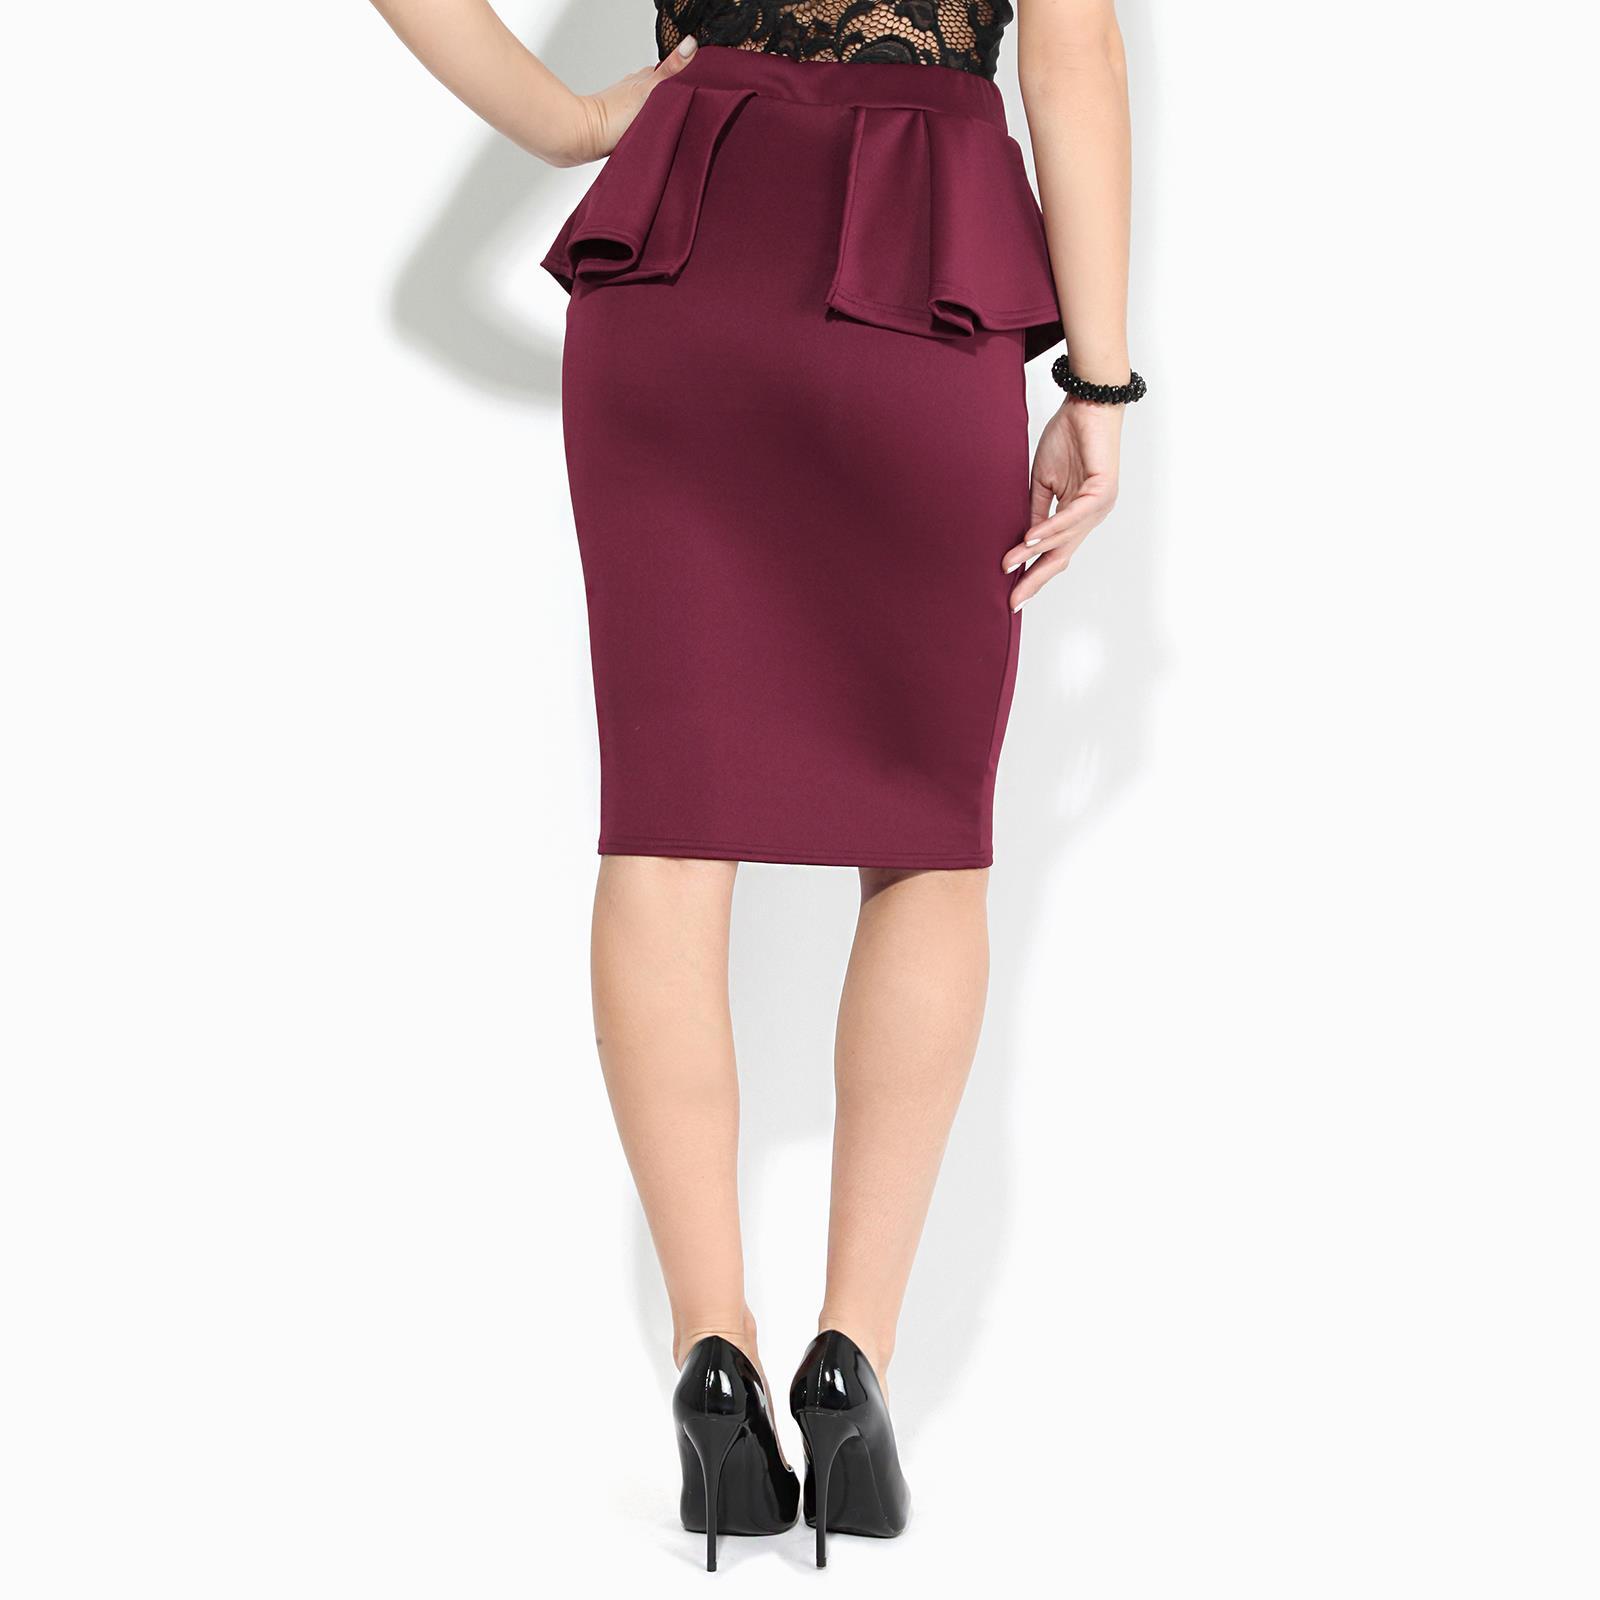 Women-Ladies-Peplum-Pencil-Midi-Skirt-Ruffle-Frill-Waist-Bodycon-Party-Office thumbnail 11